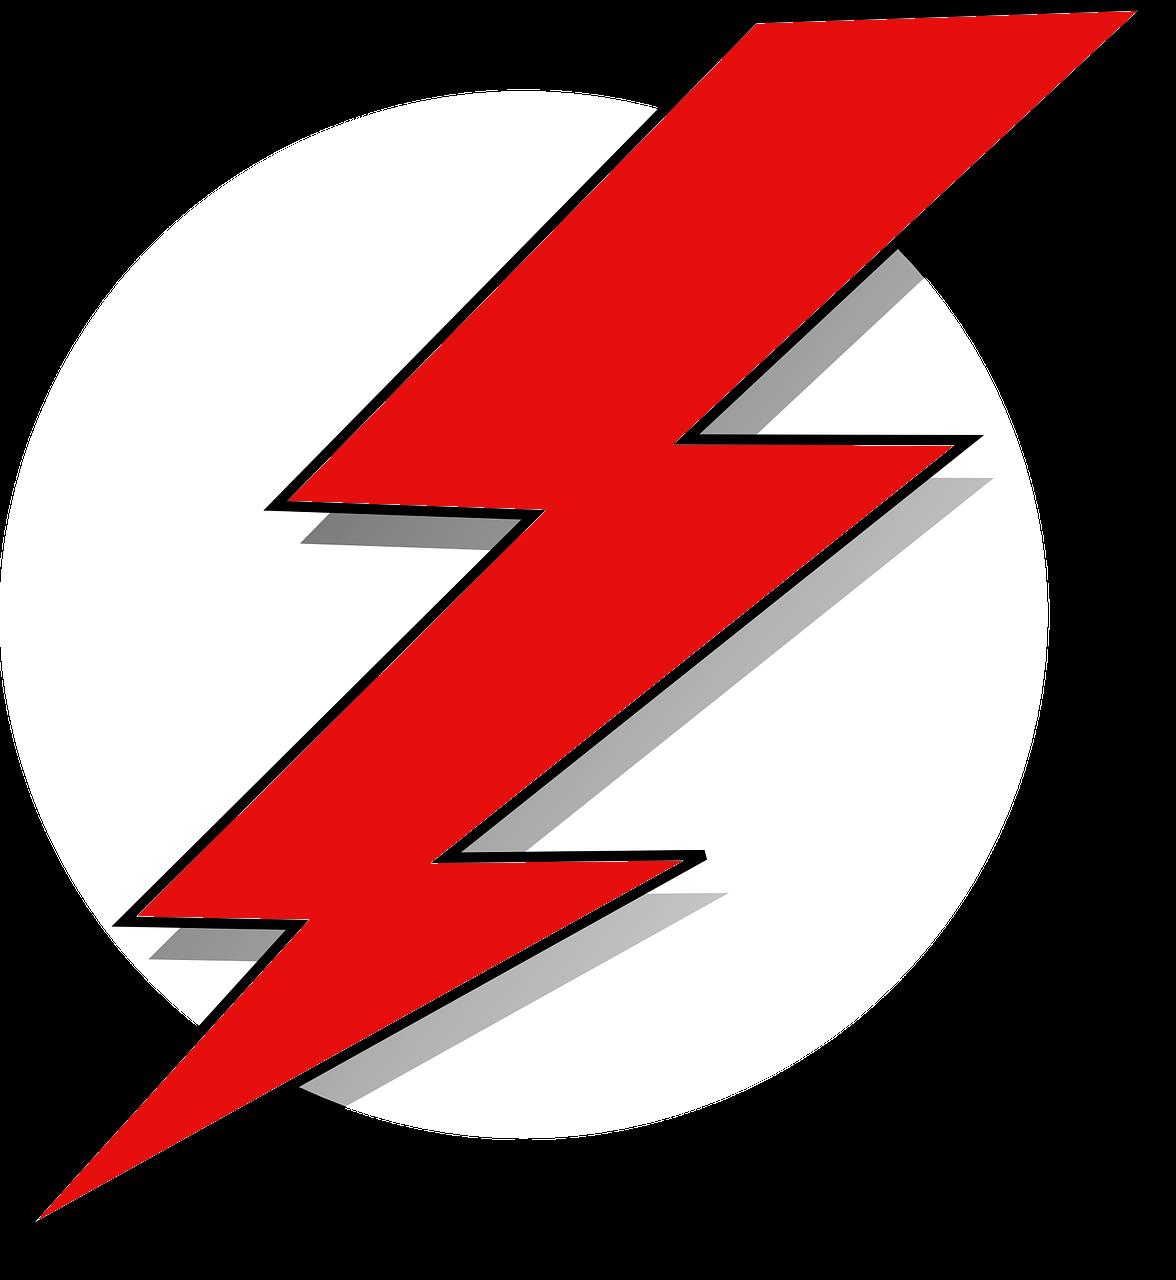 lightning-red.png